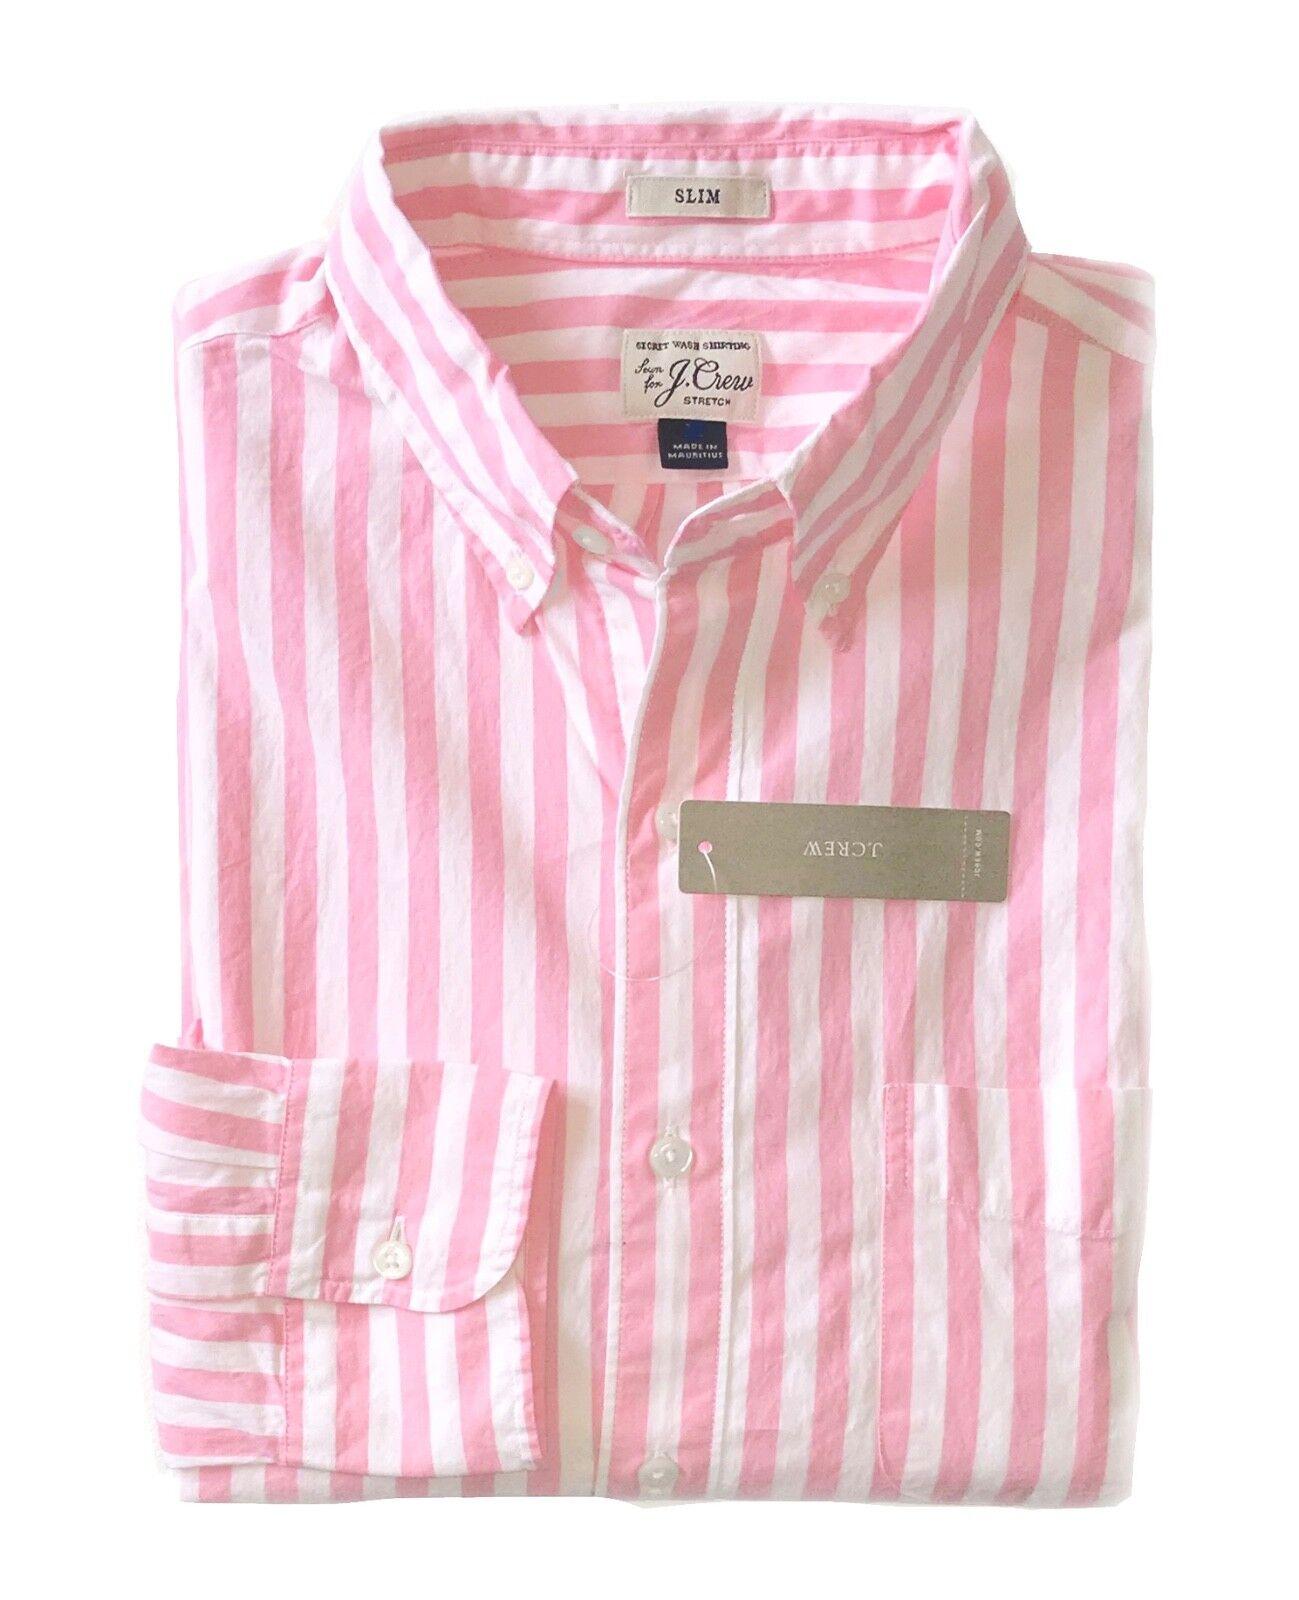 J.Crew - Mens XXL - Slim Fit - NWT - Pink White Striped Secret Wash Cotton Shirt